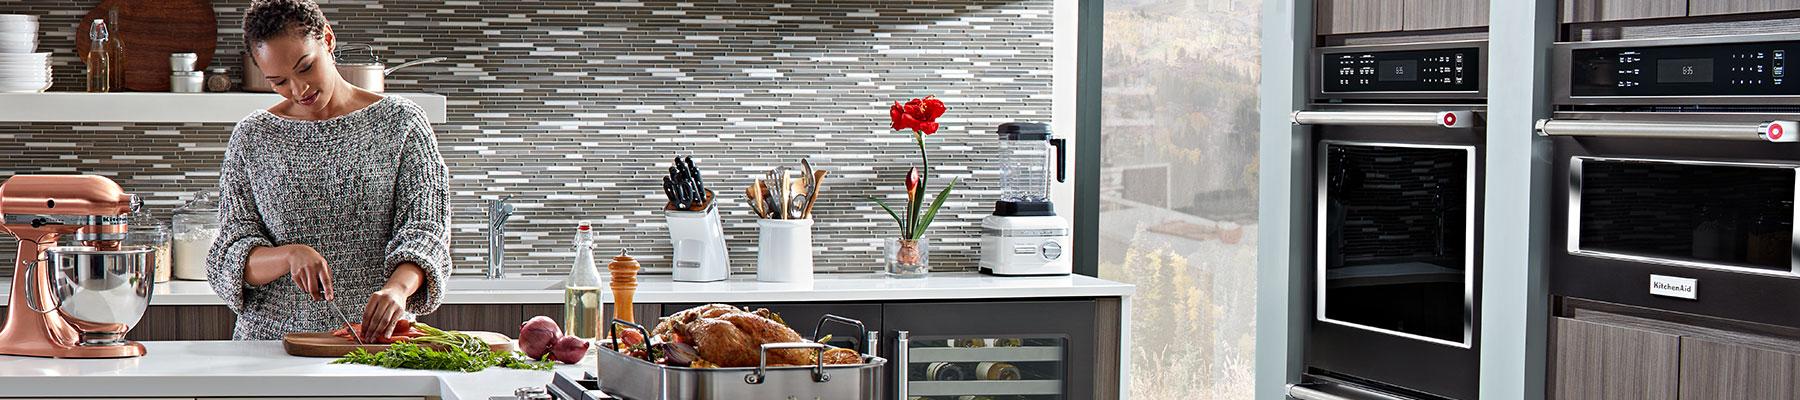 About Us - KitchenAid Kitchen